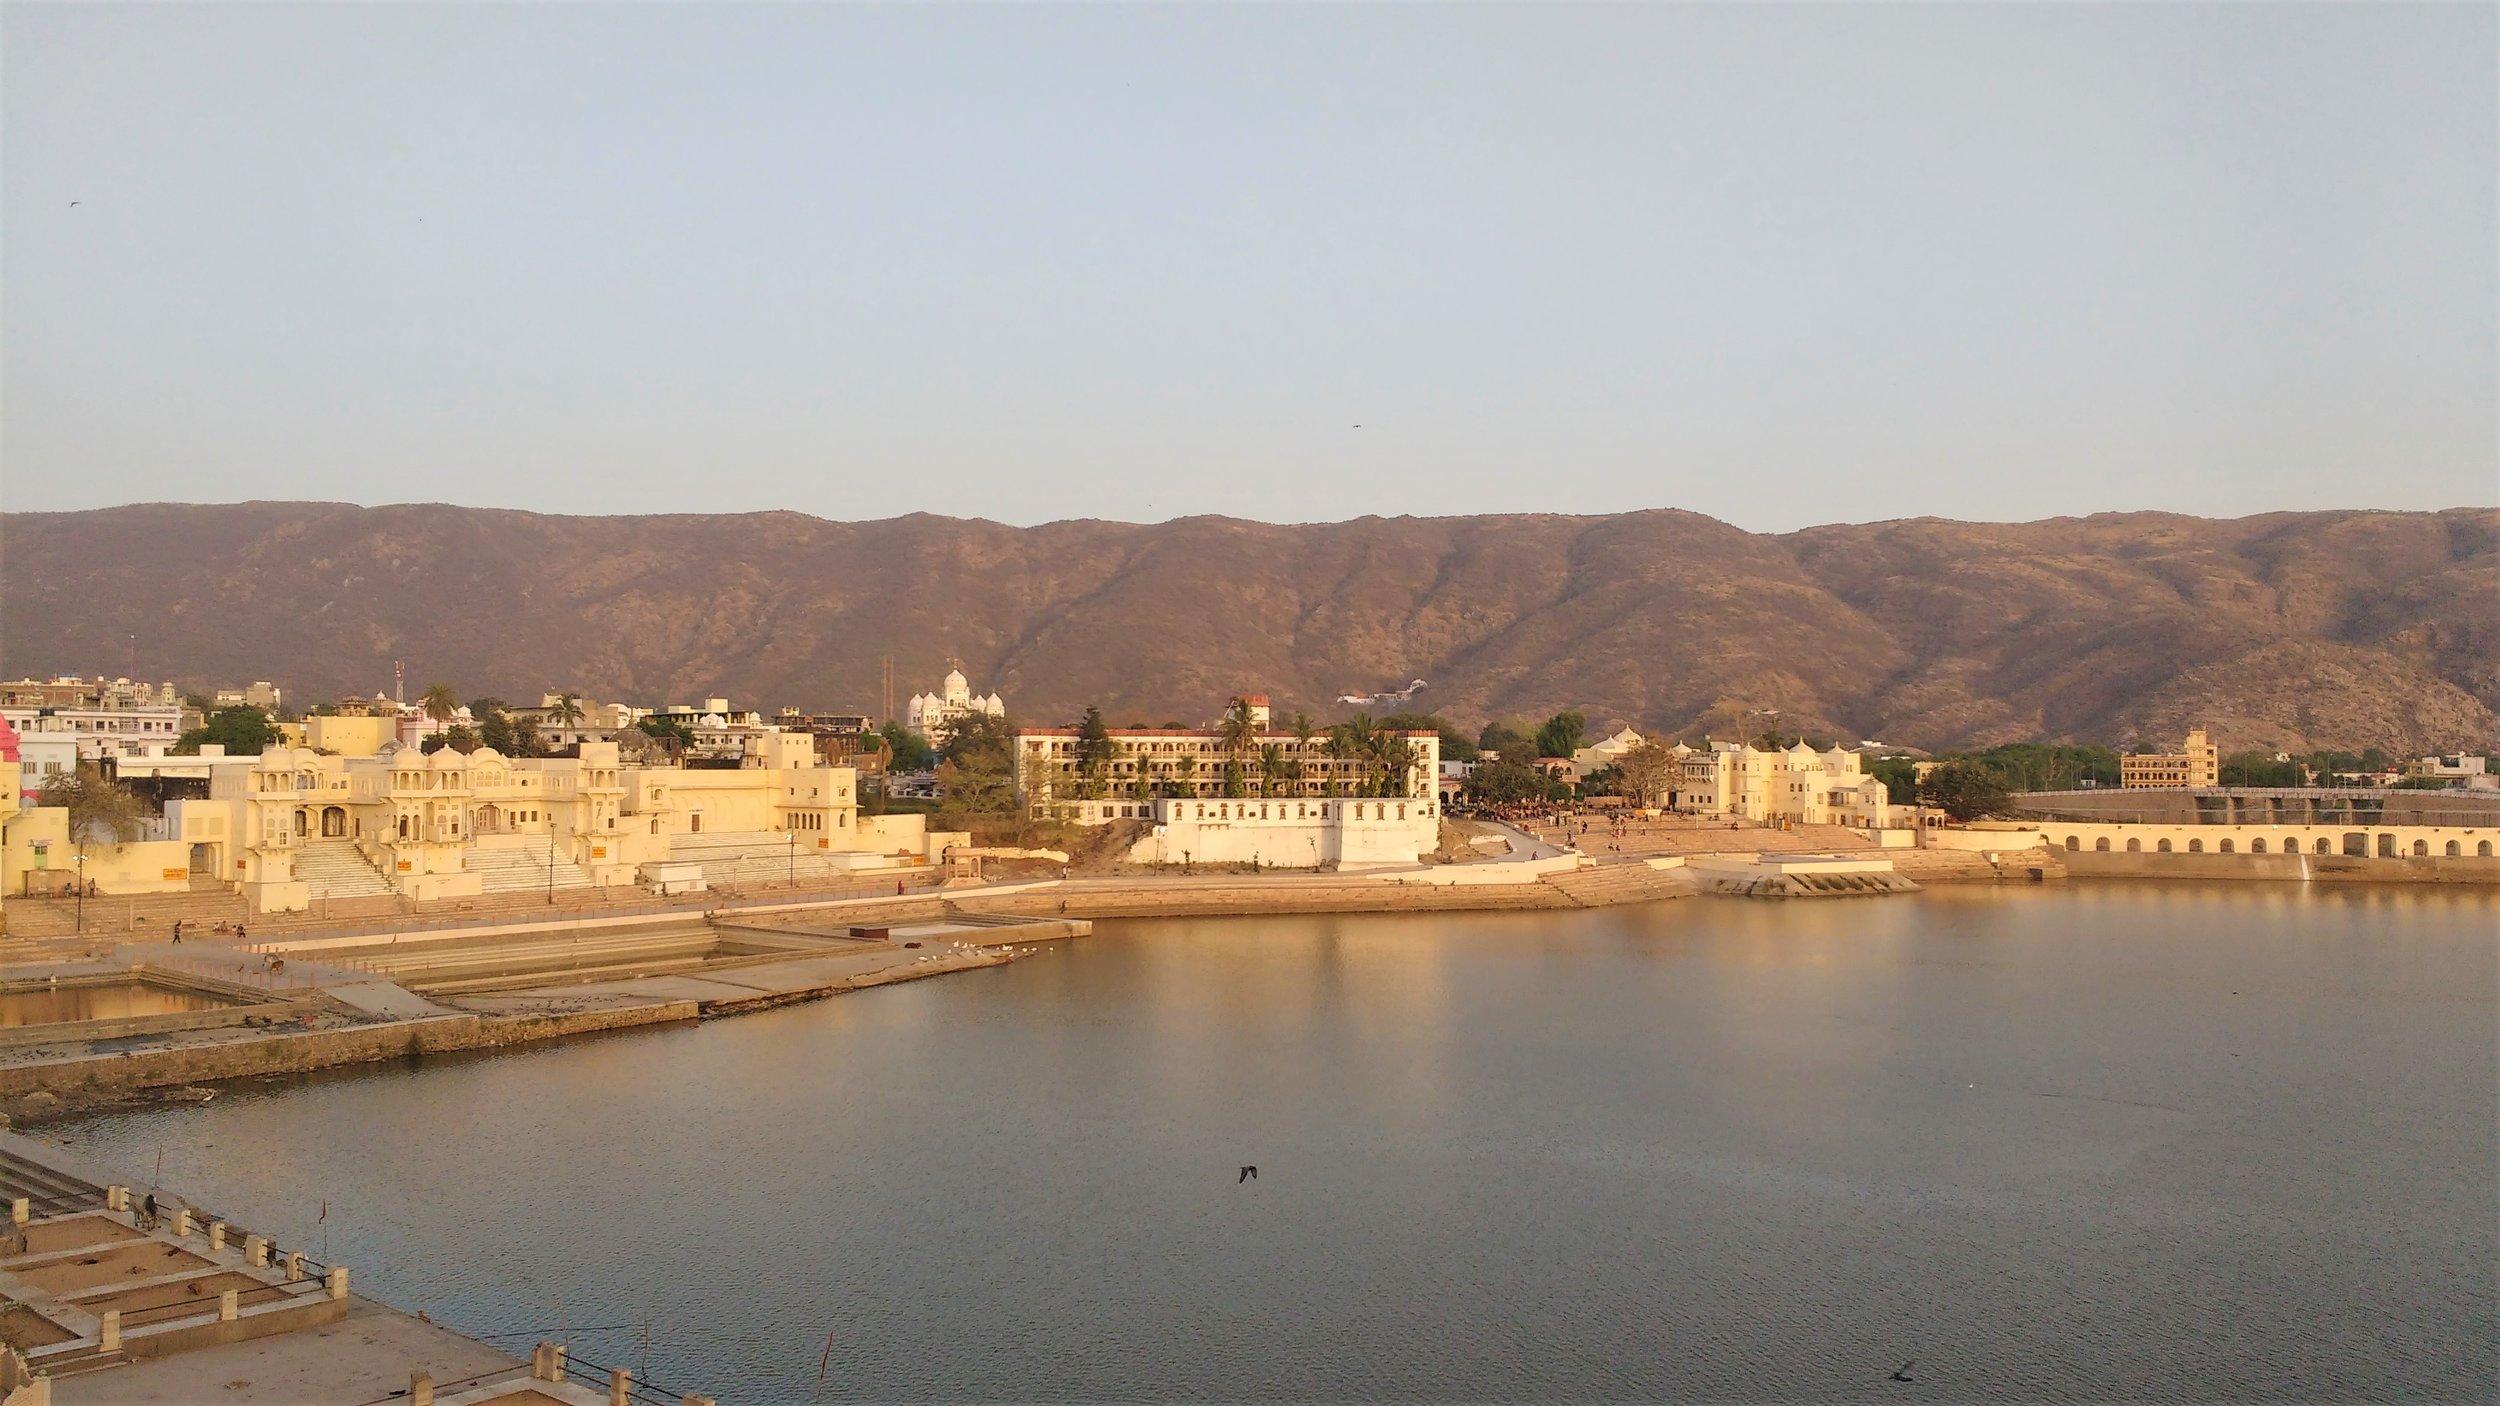 Nice views over the lake in Pushkar.